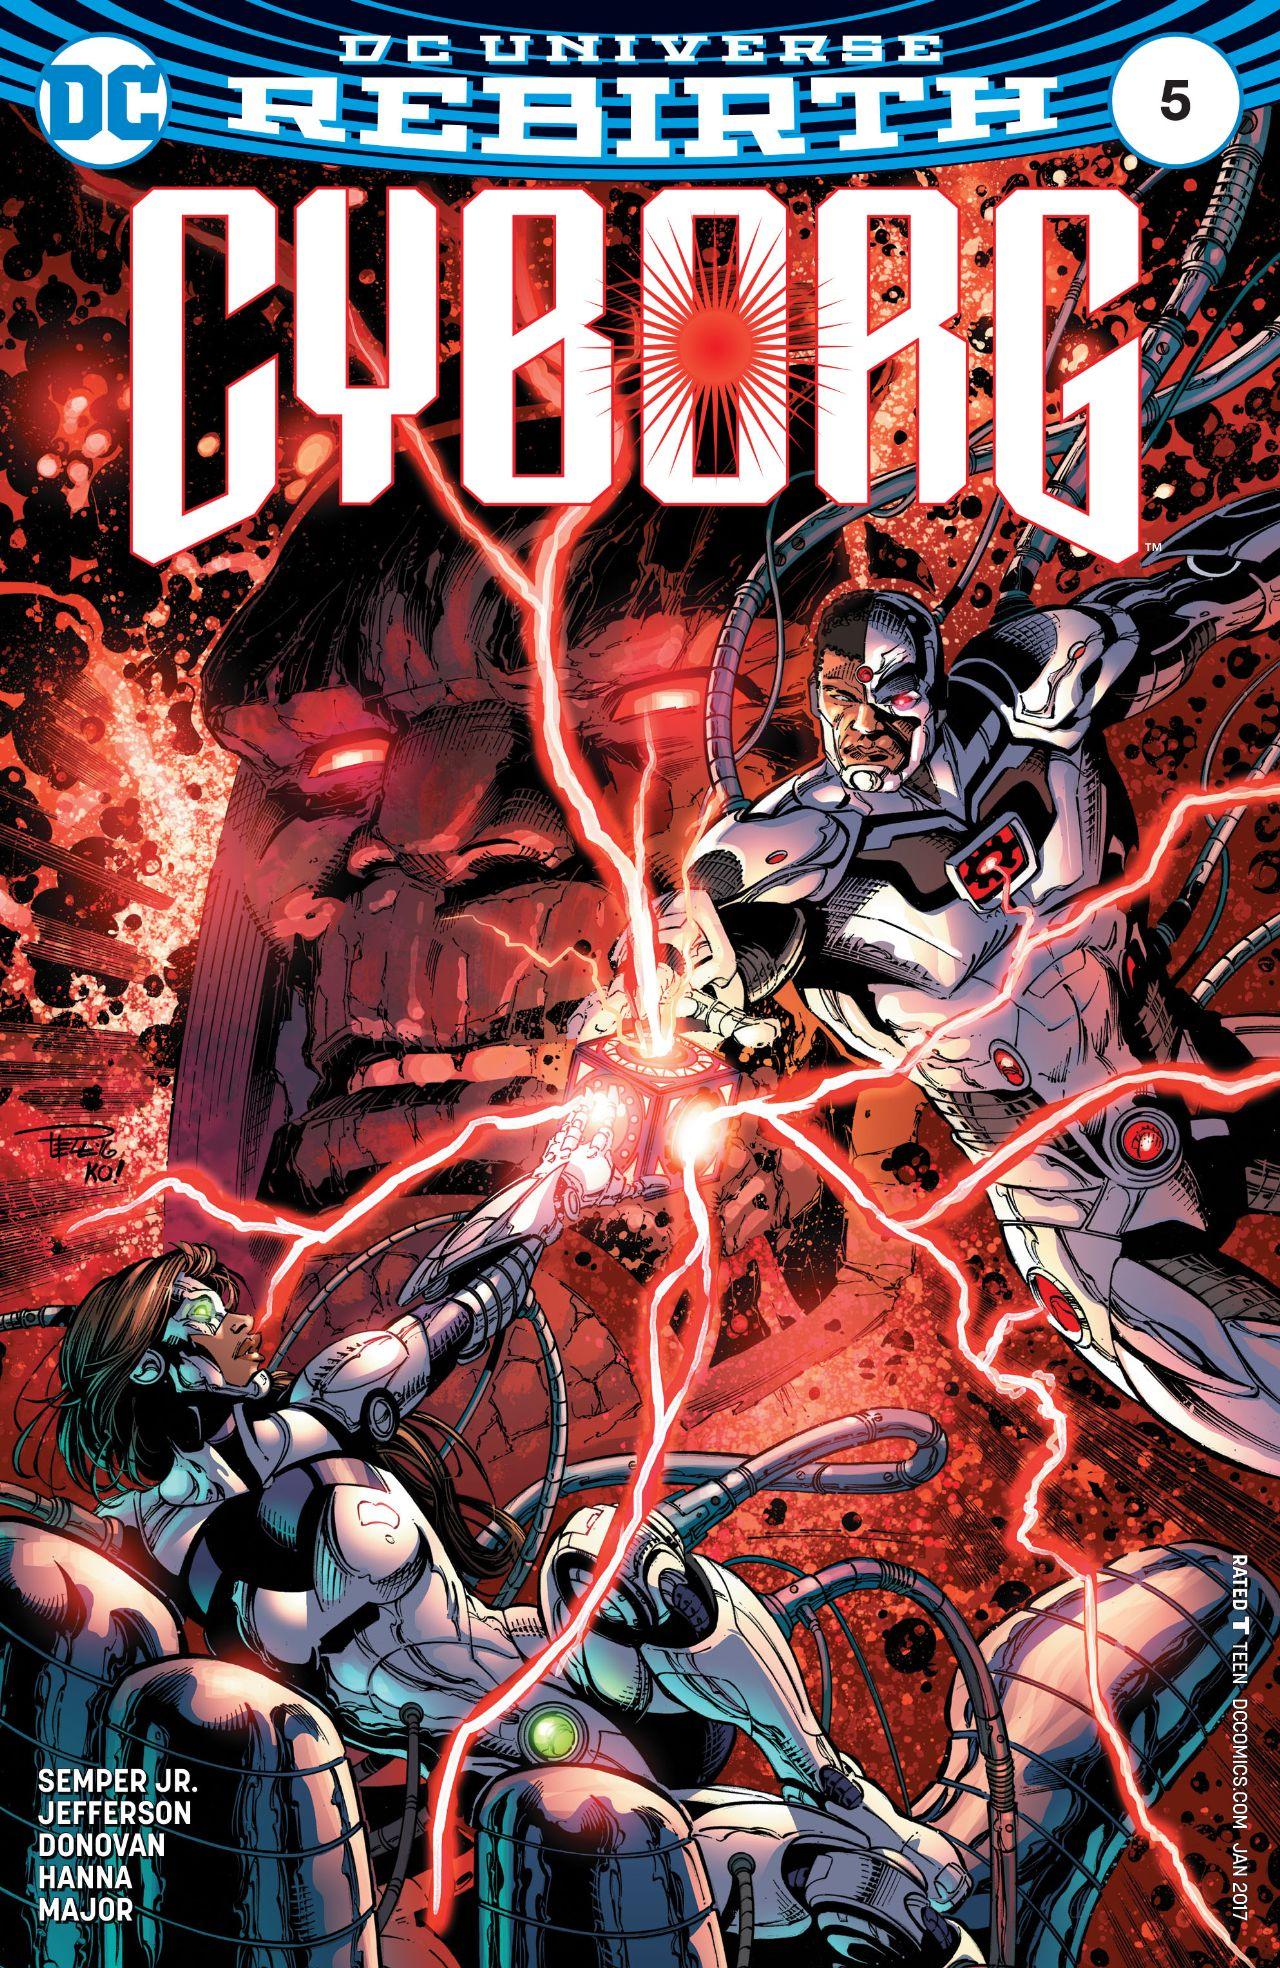 Cyborg Vol 2 5